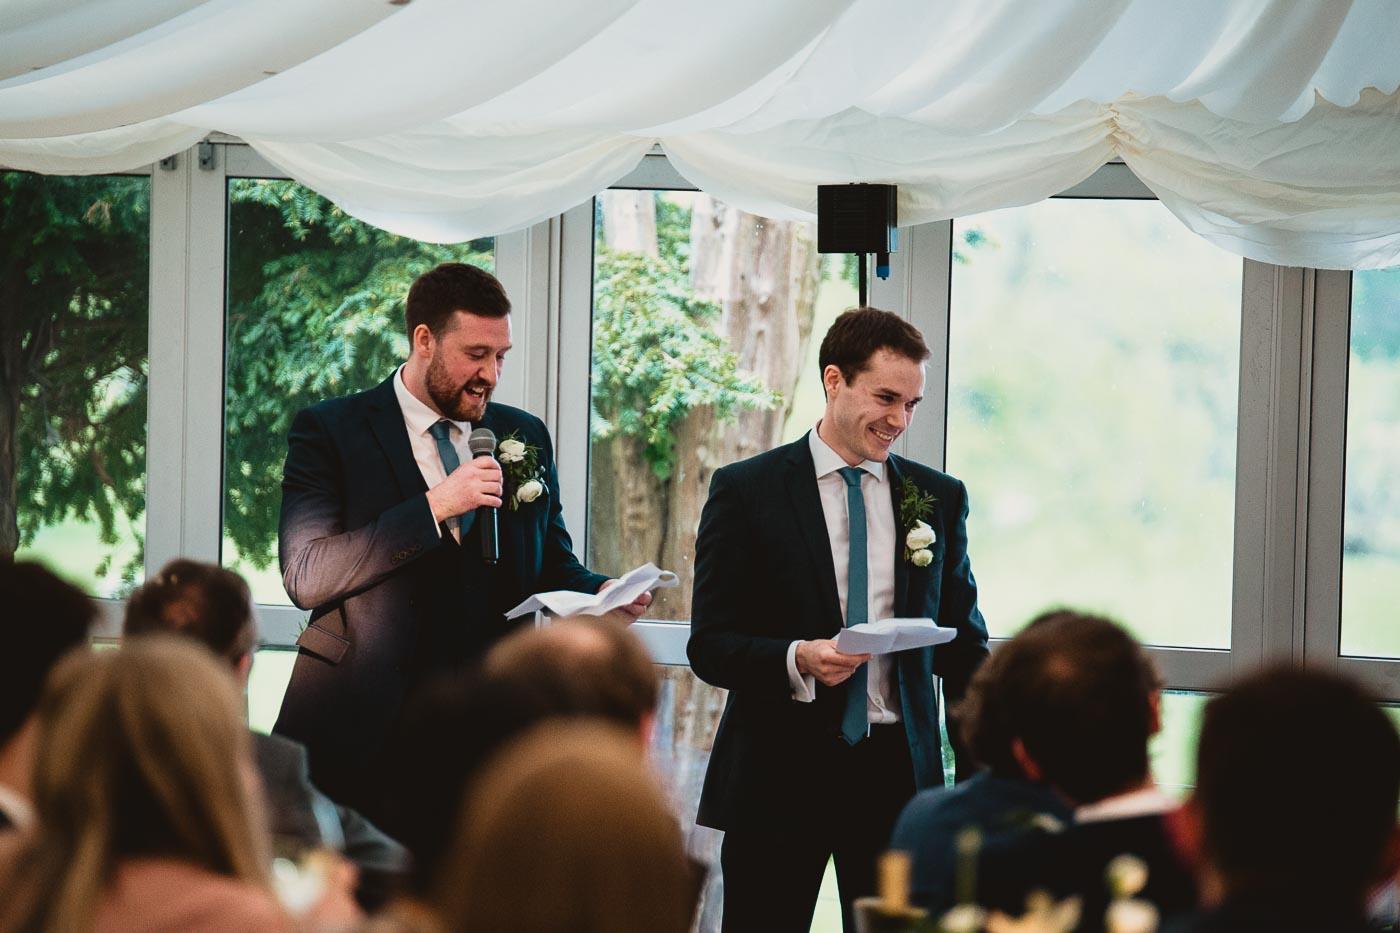 Two best men giving speeches